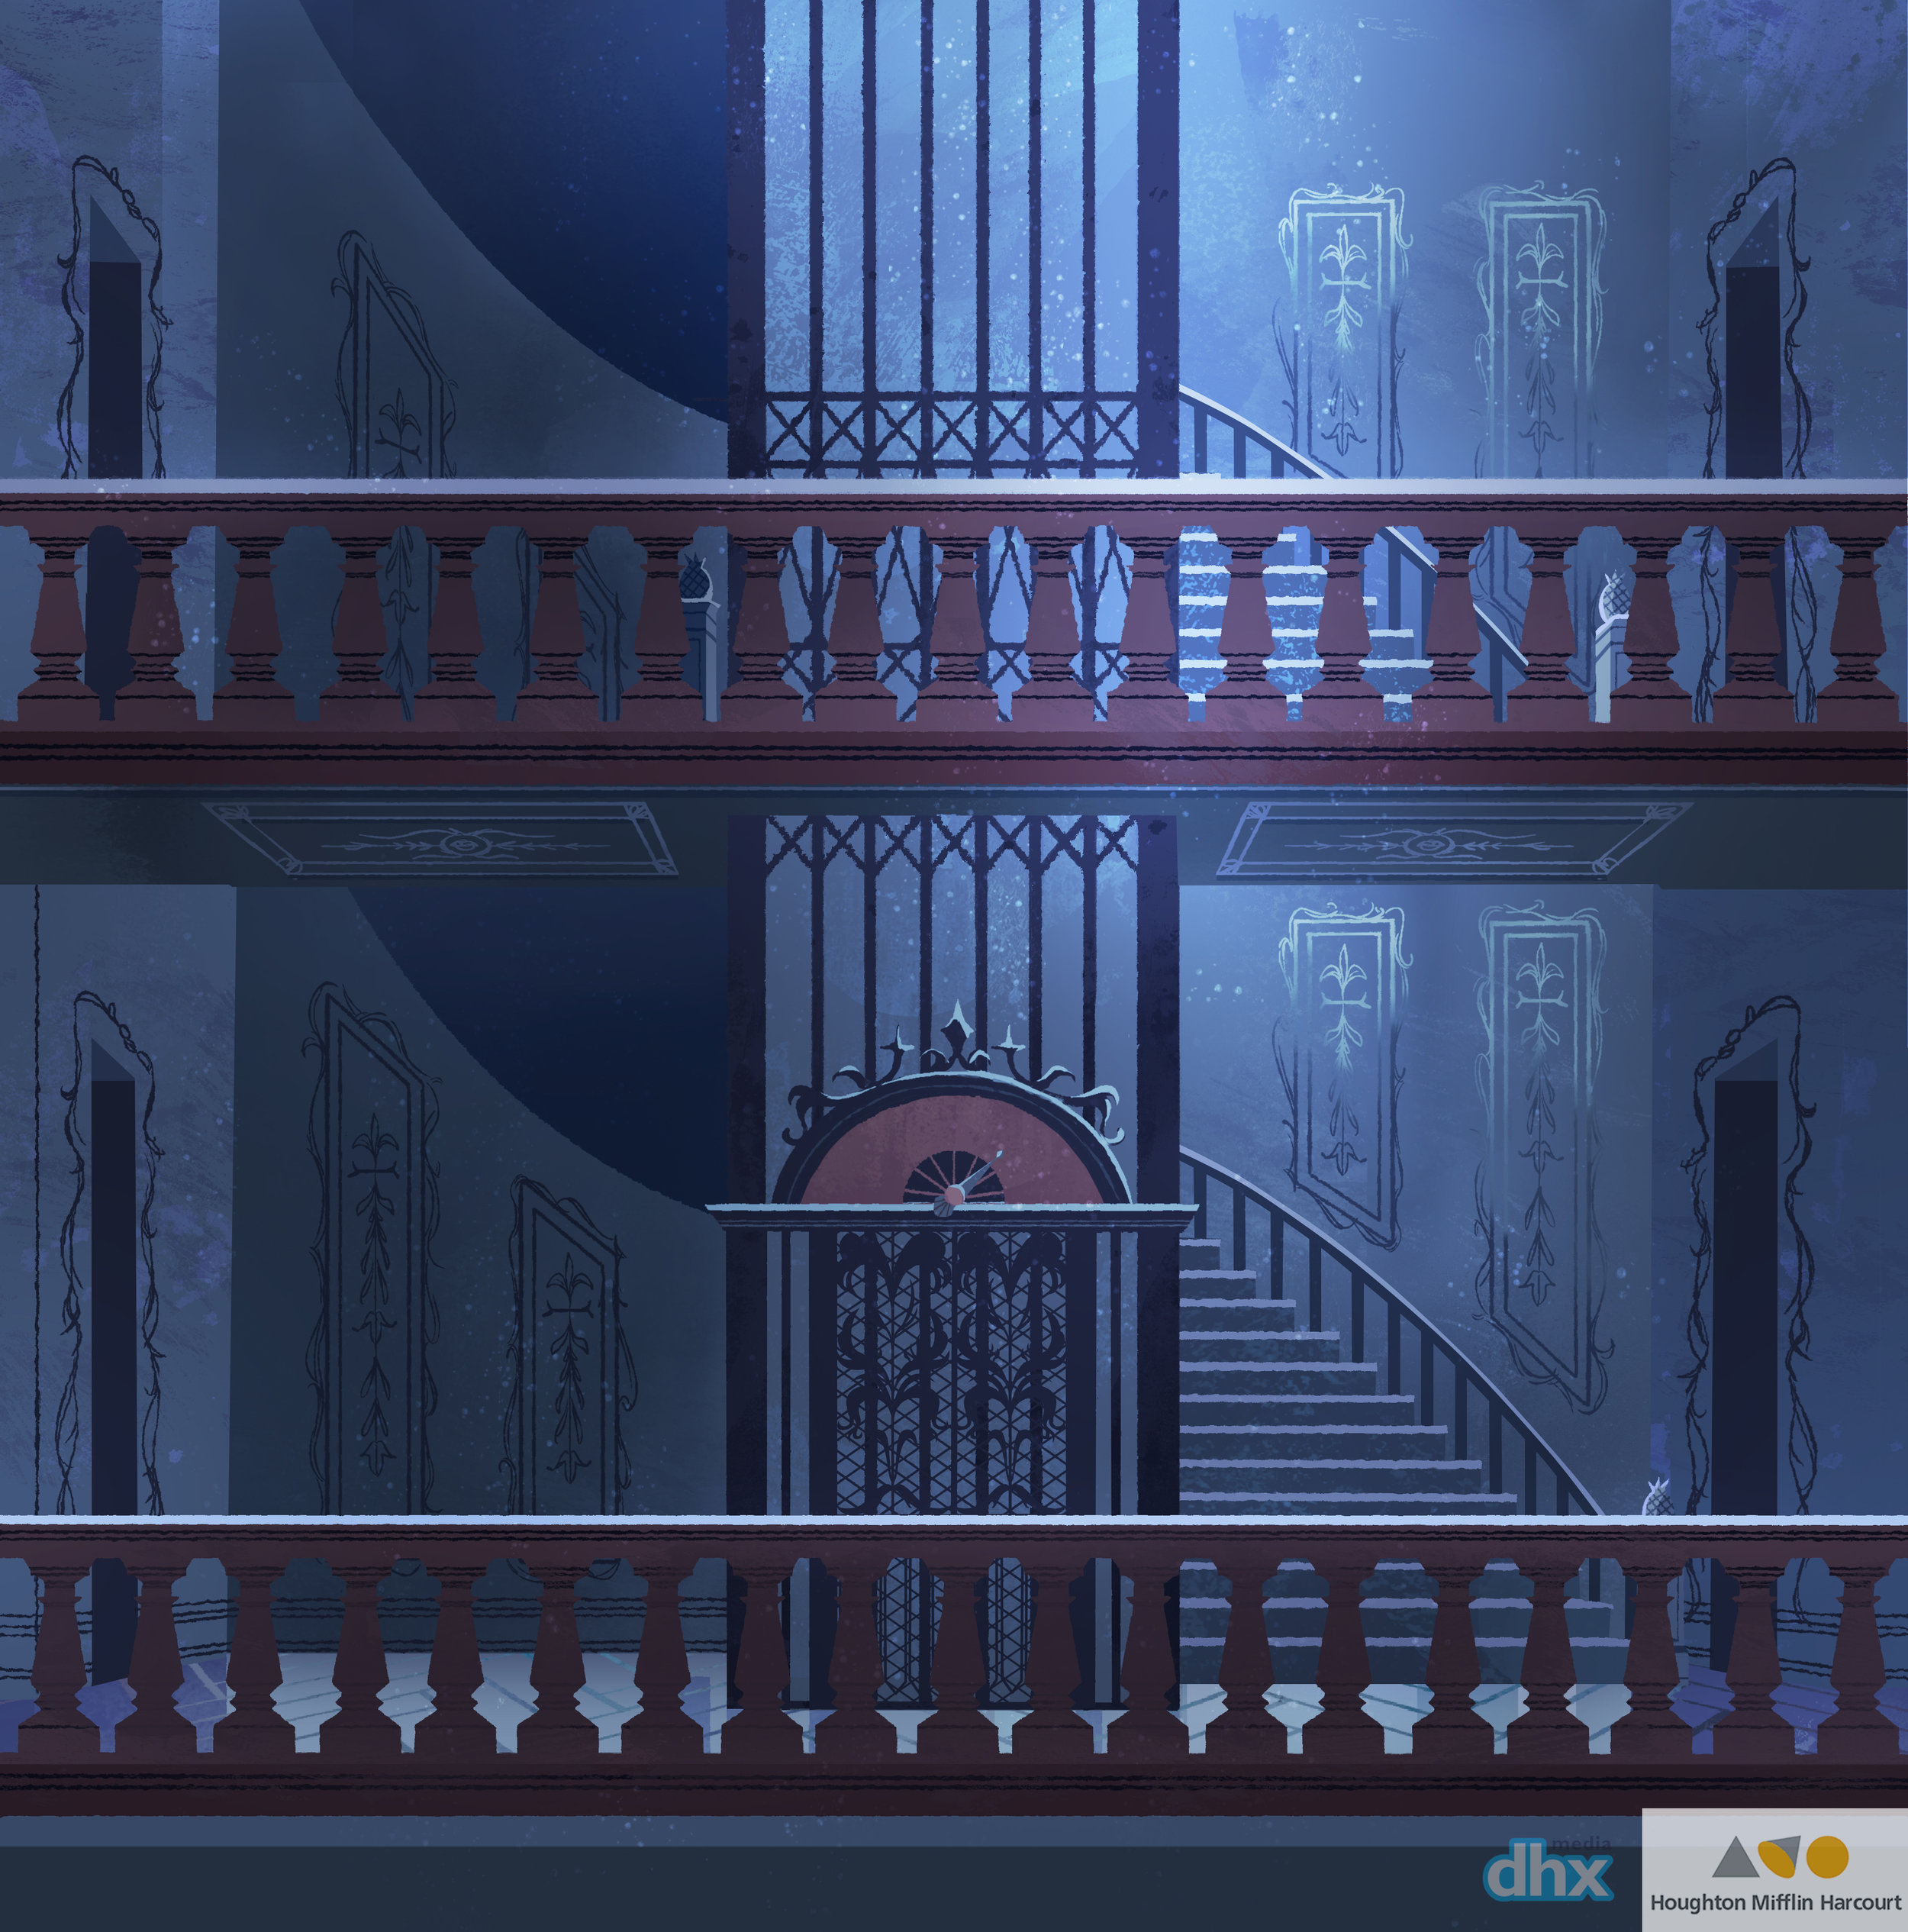 101_113_int_chateau_stairwellelevator_logo.jpg